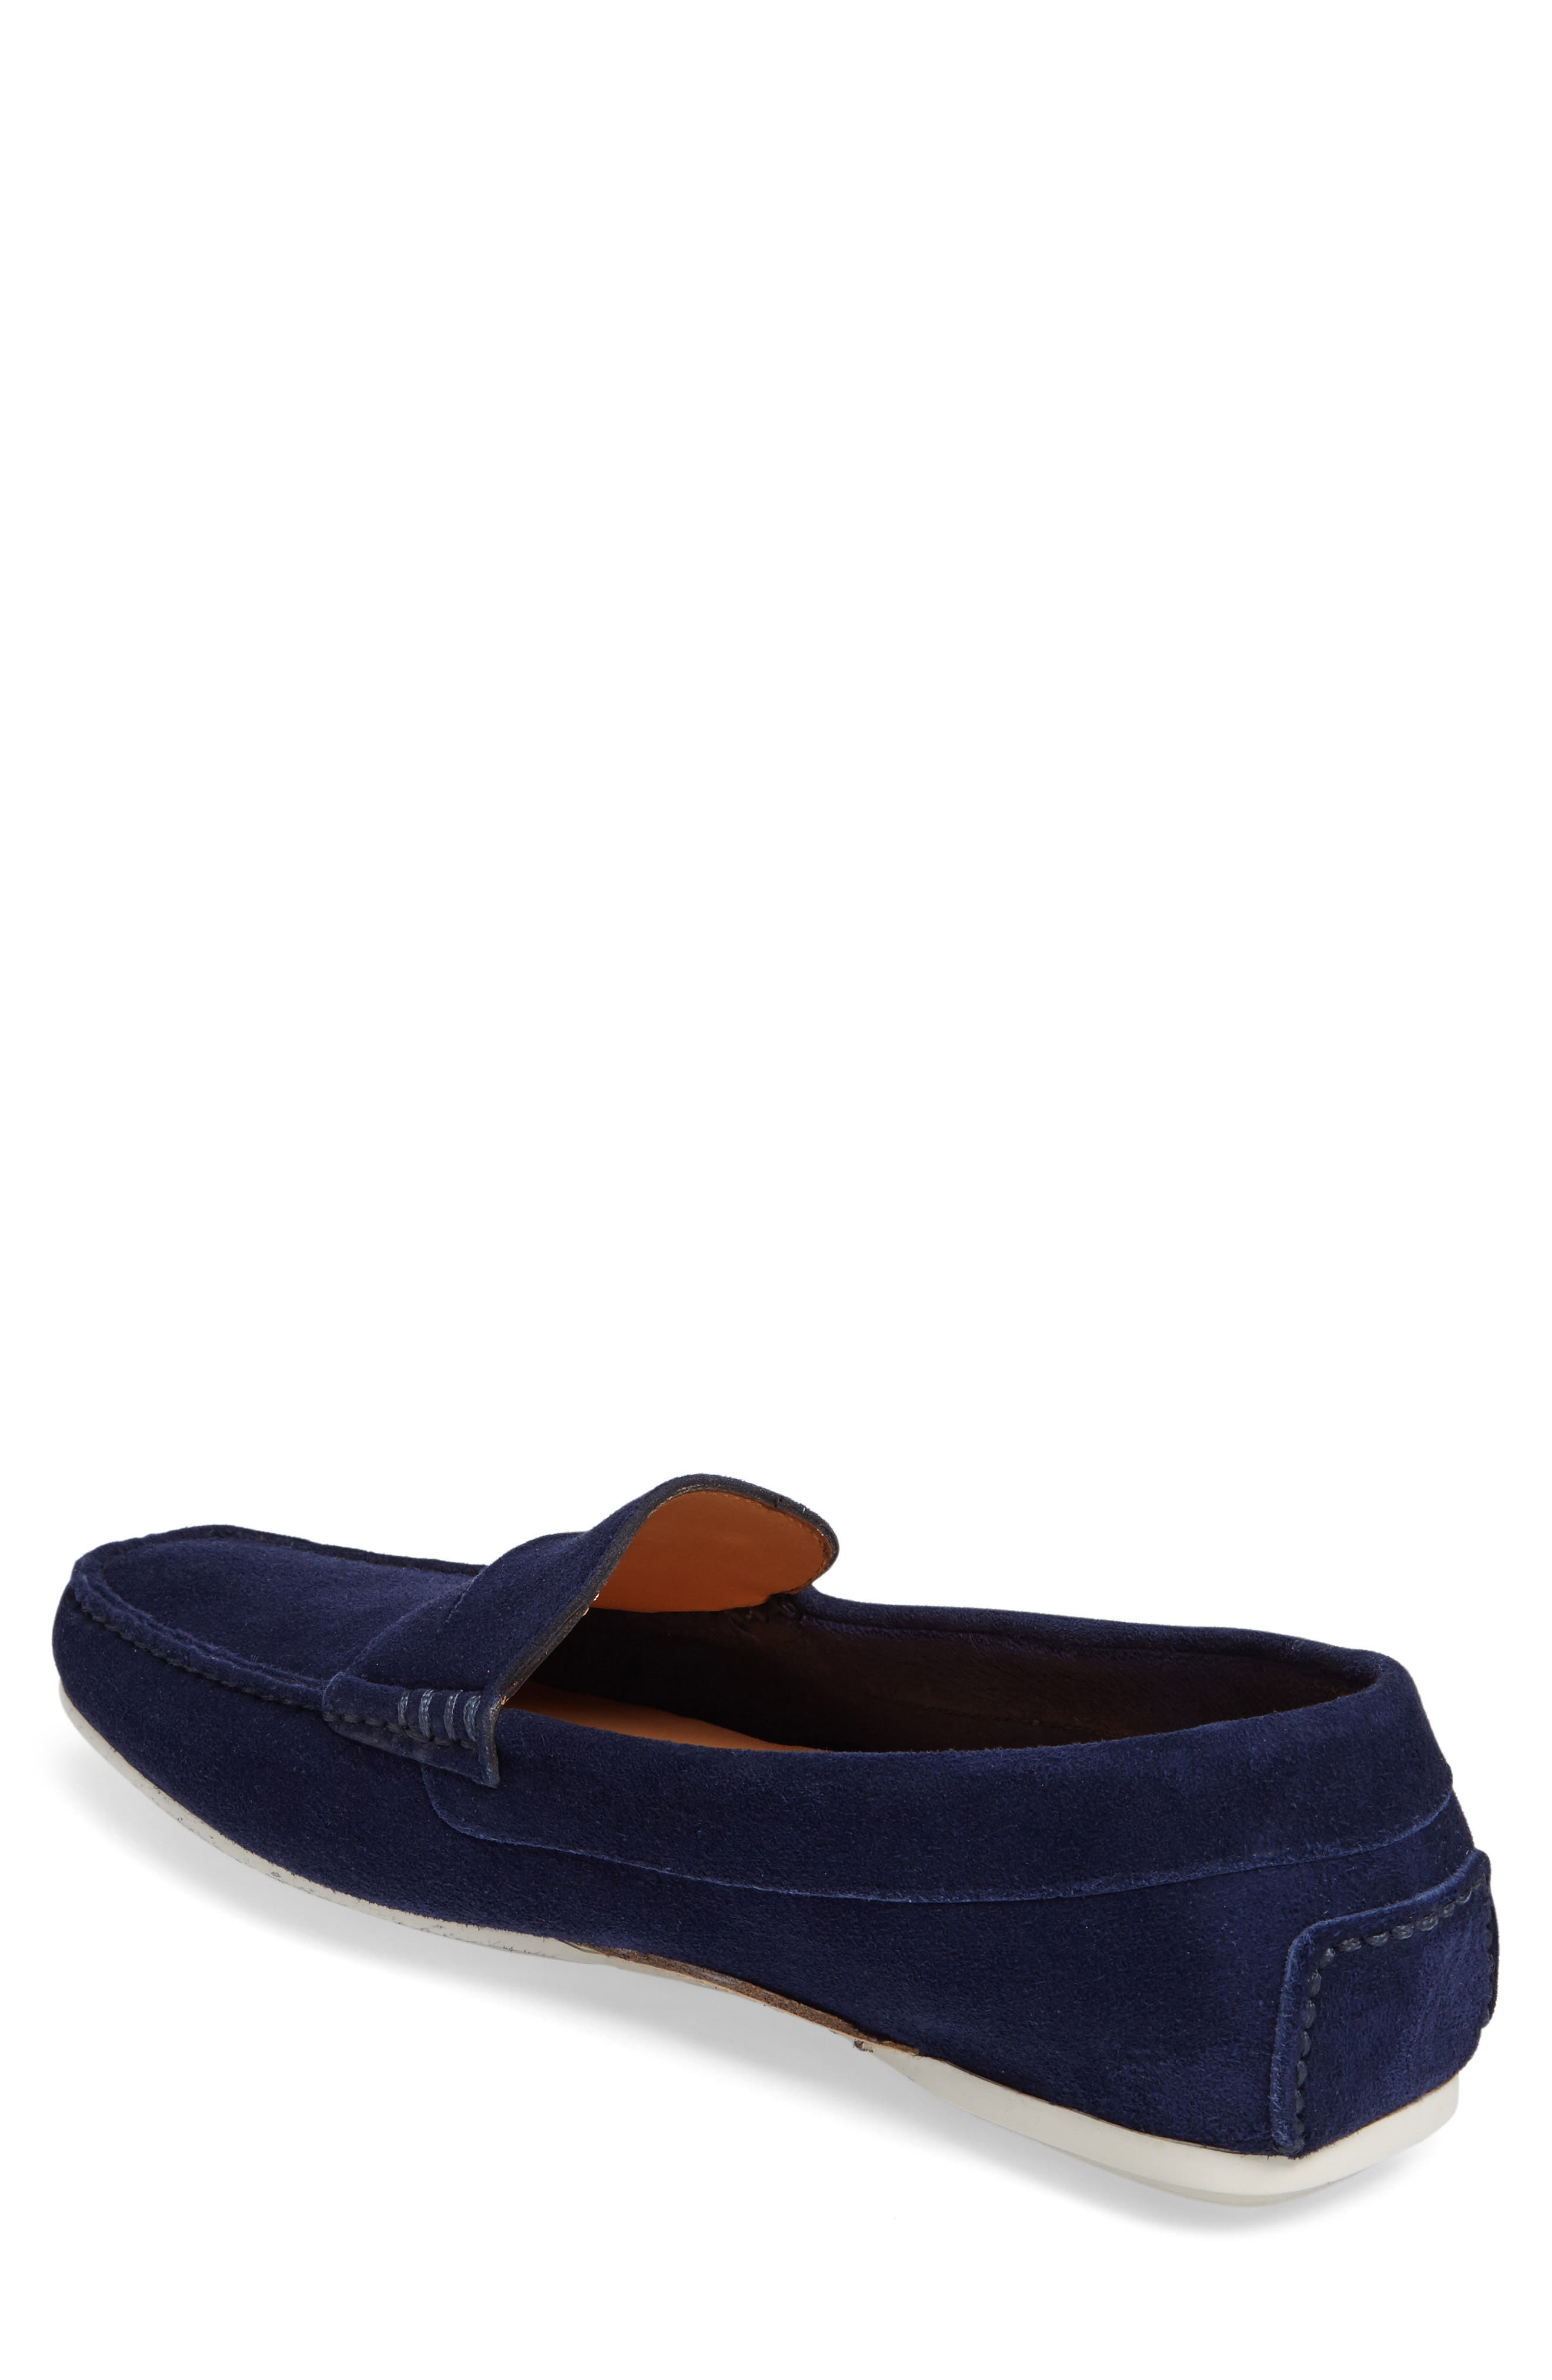 Alternate Image 2  - Santoni 'Tanton' Driving Shoe